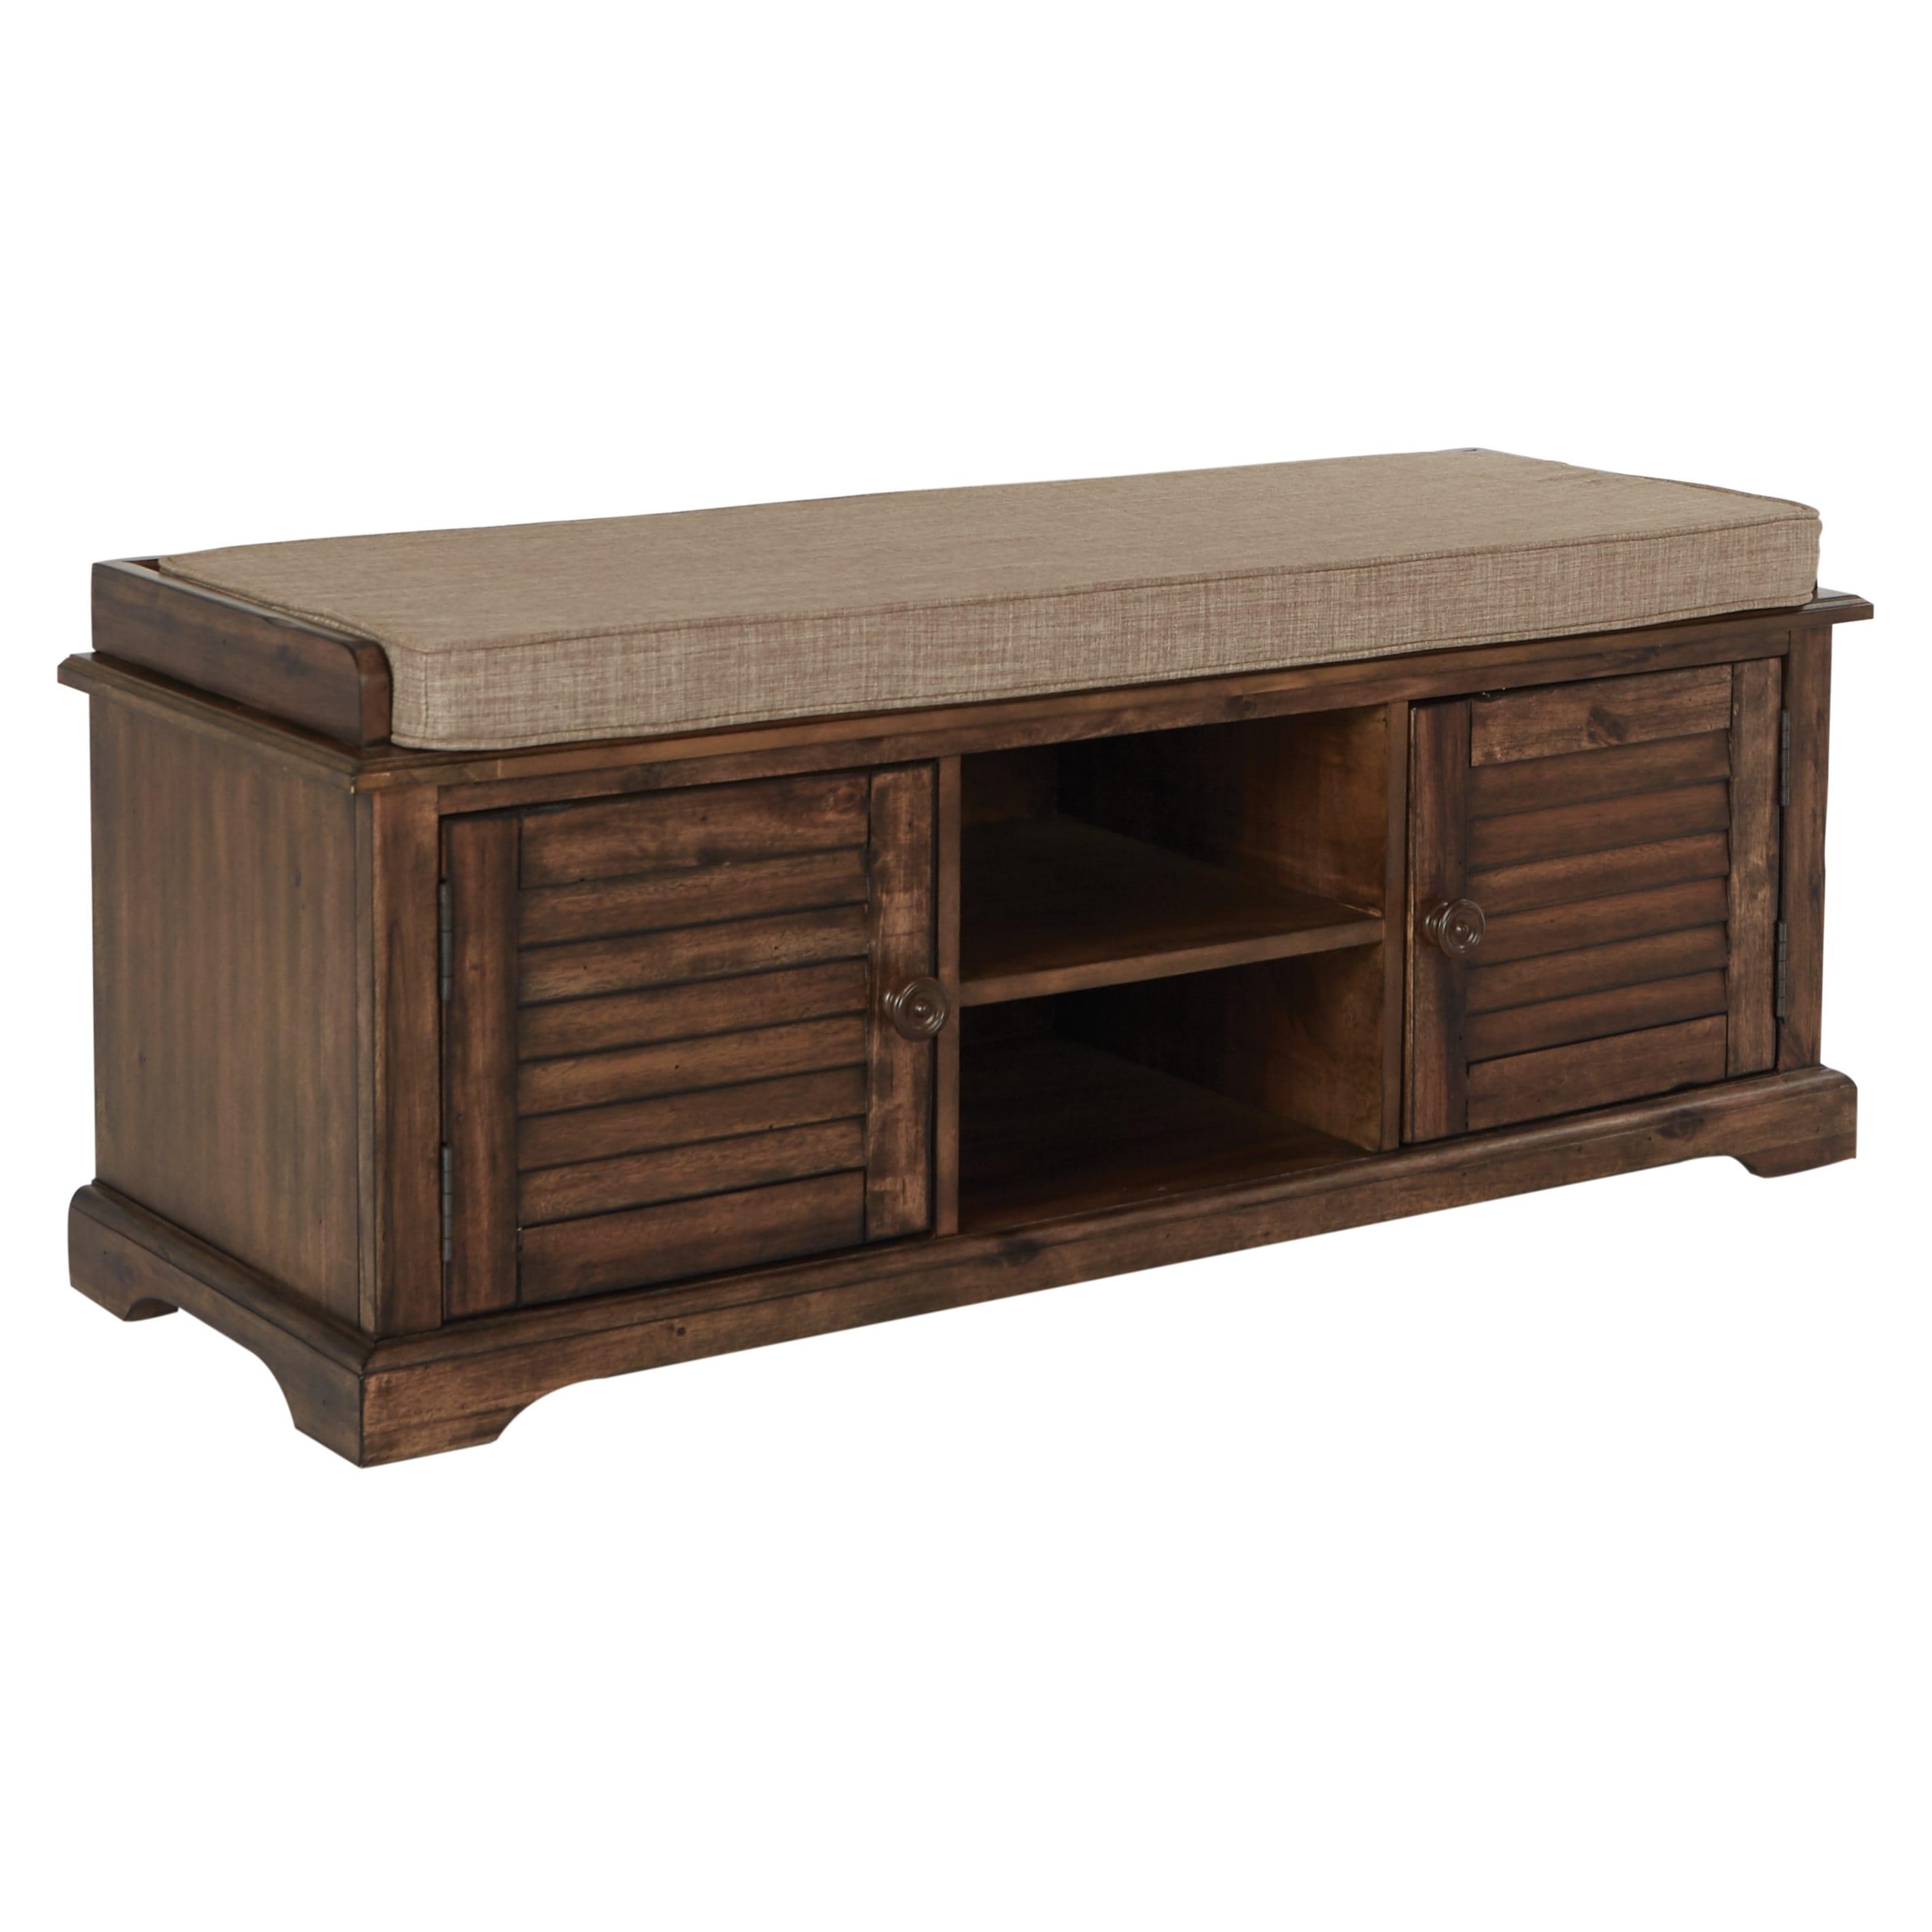 Groovy Osp Home Furnishings Canton Caramel Wood Storage Bench Beatyapartments Chair Design Images Beatyapartmentscom